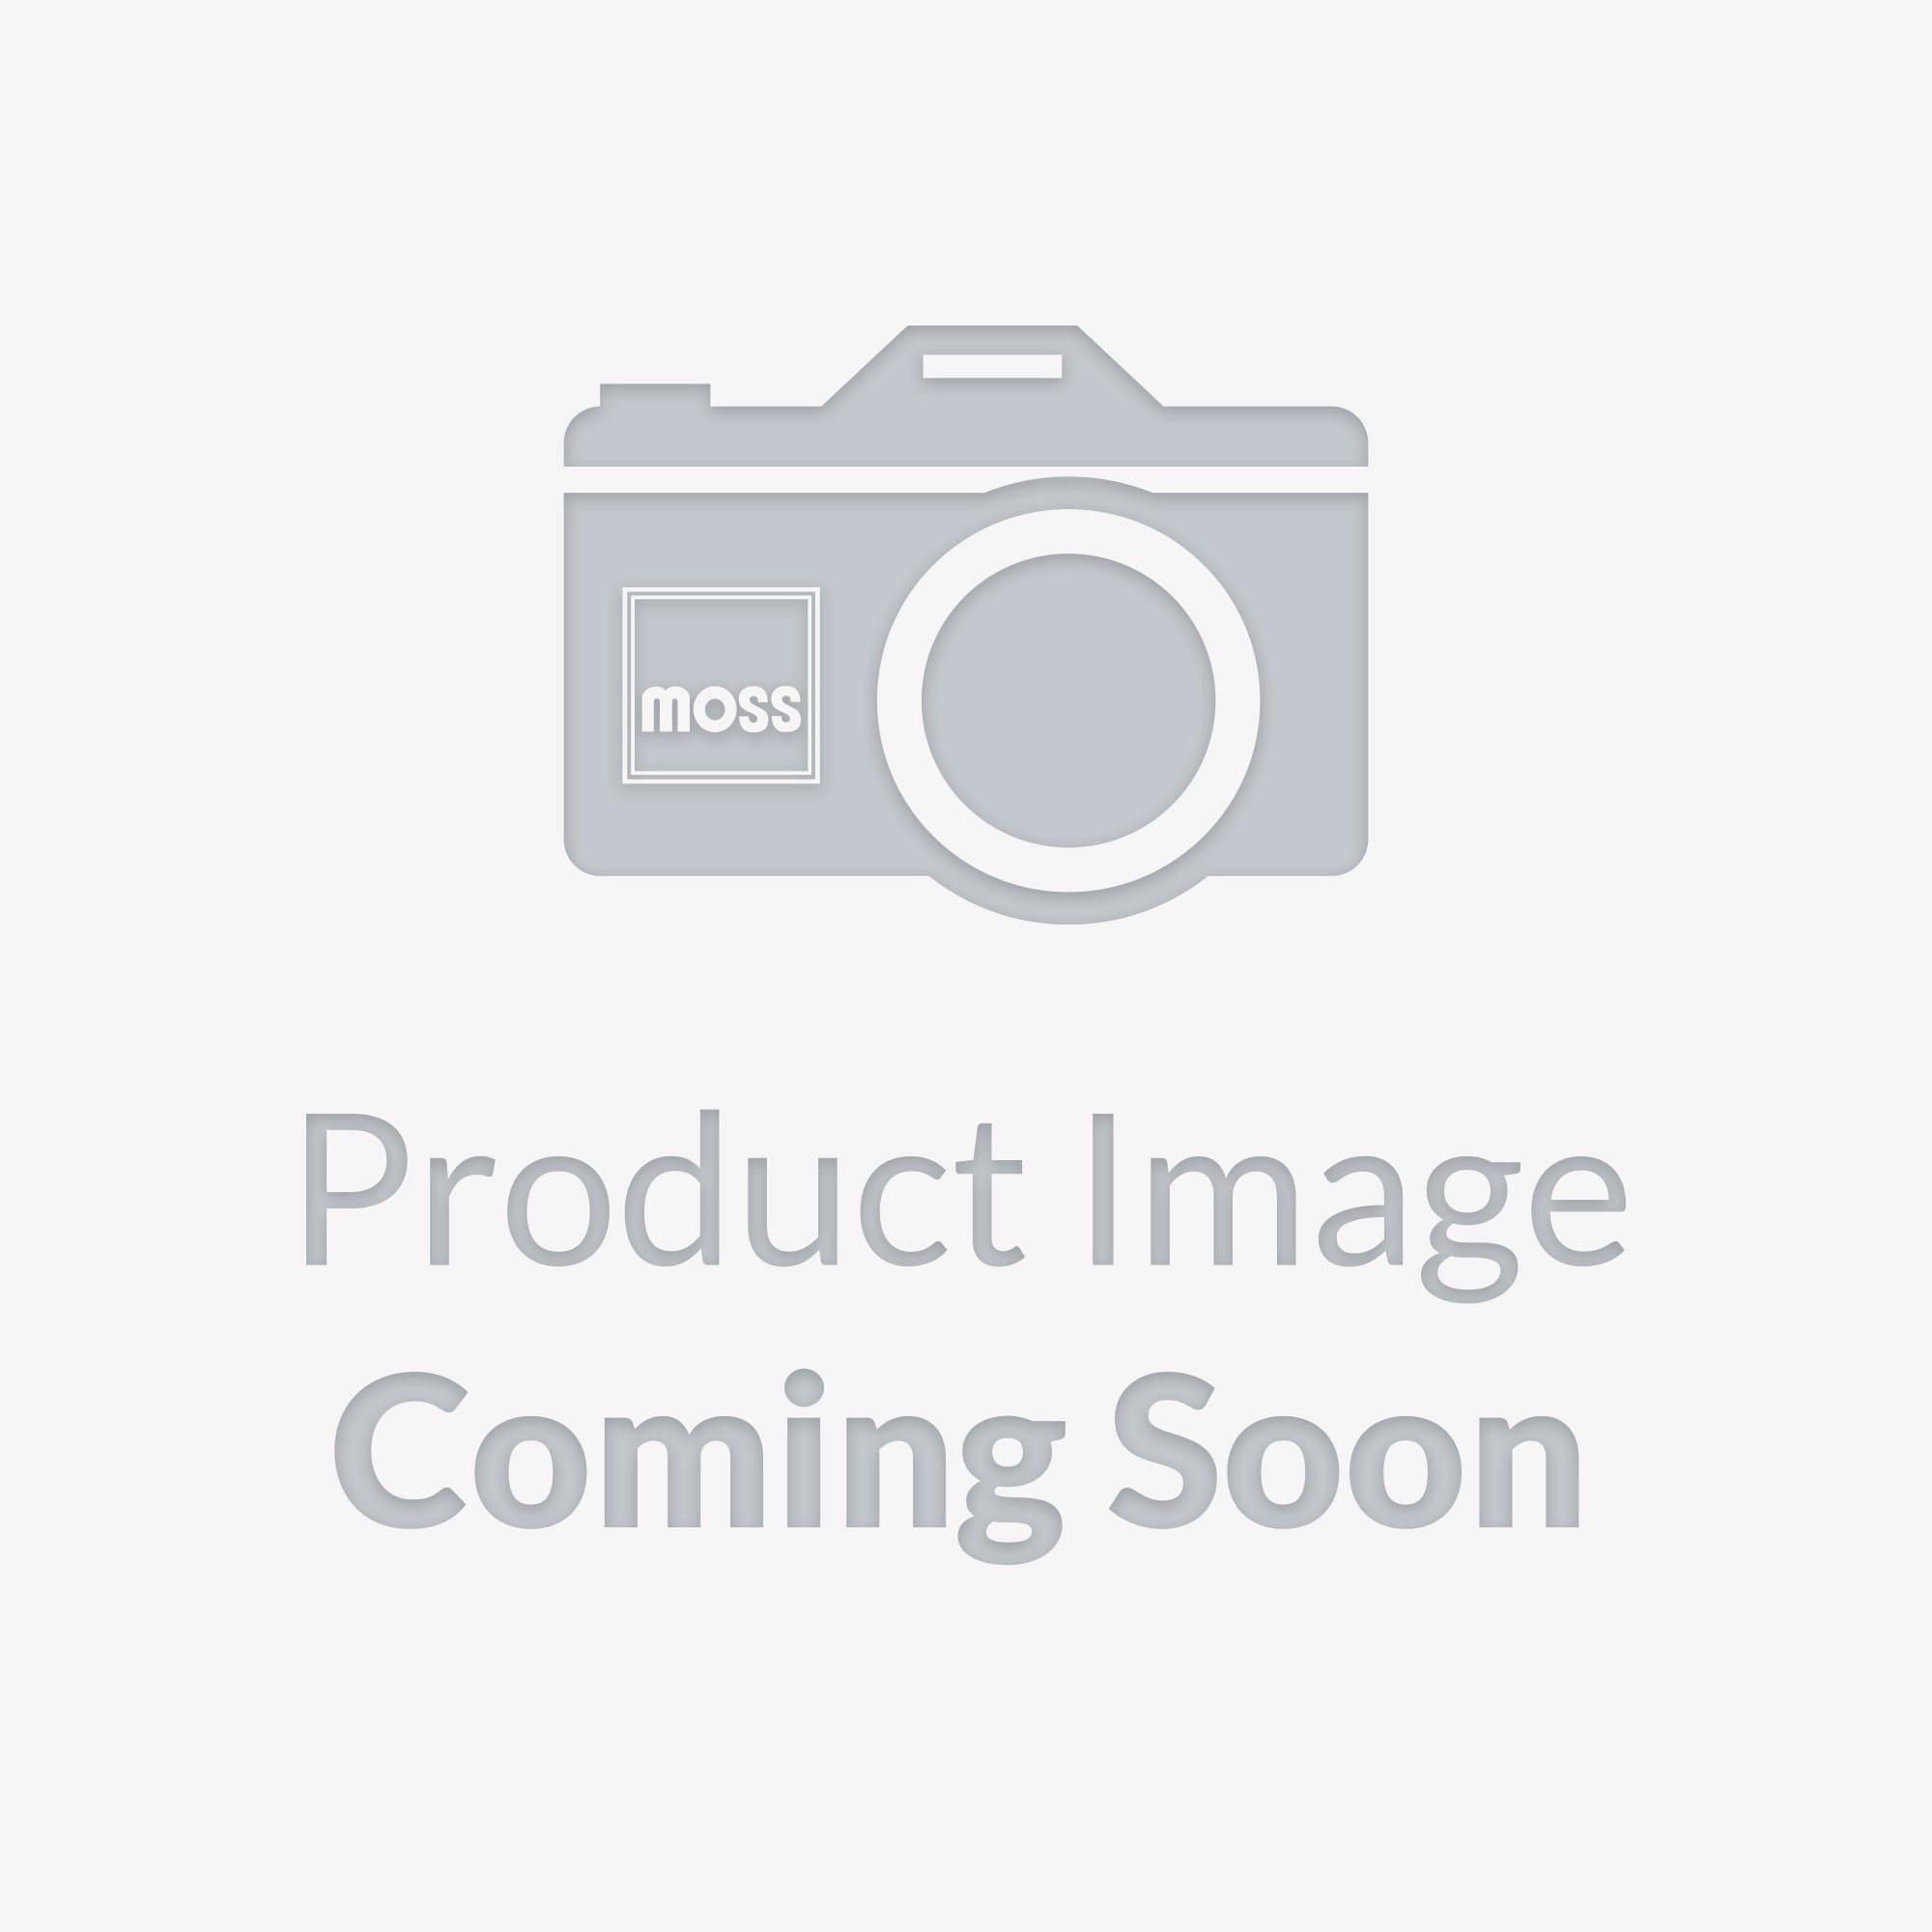 CLASSIC MINI RED SILICONE RADIATOR TOP /& BOTTOM HOSE KIT 1275cc INC CLIPS 6P5